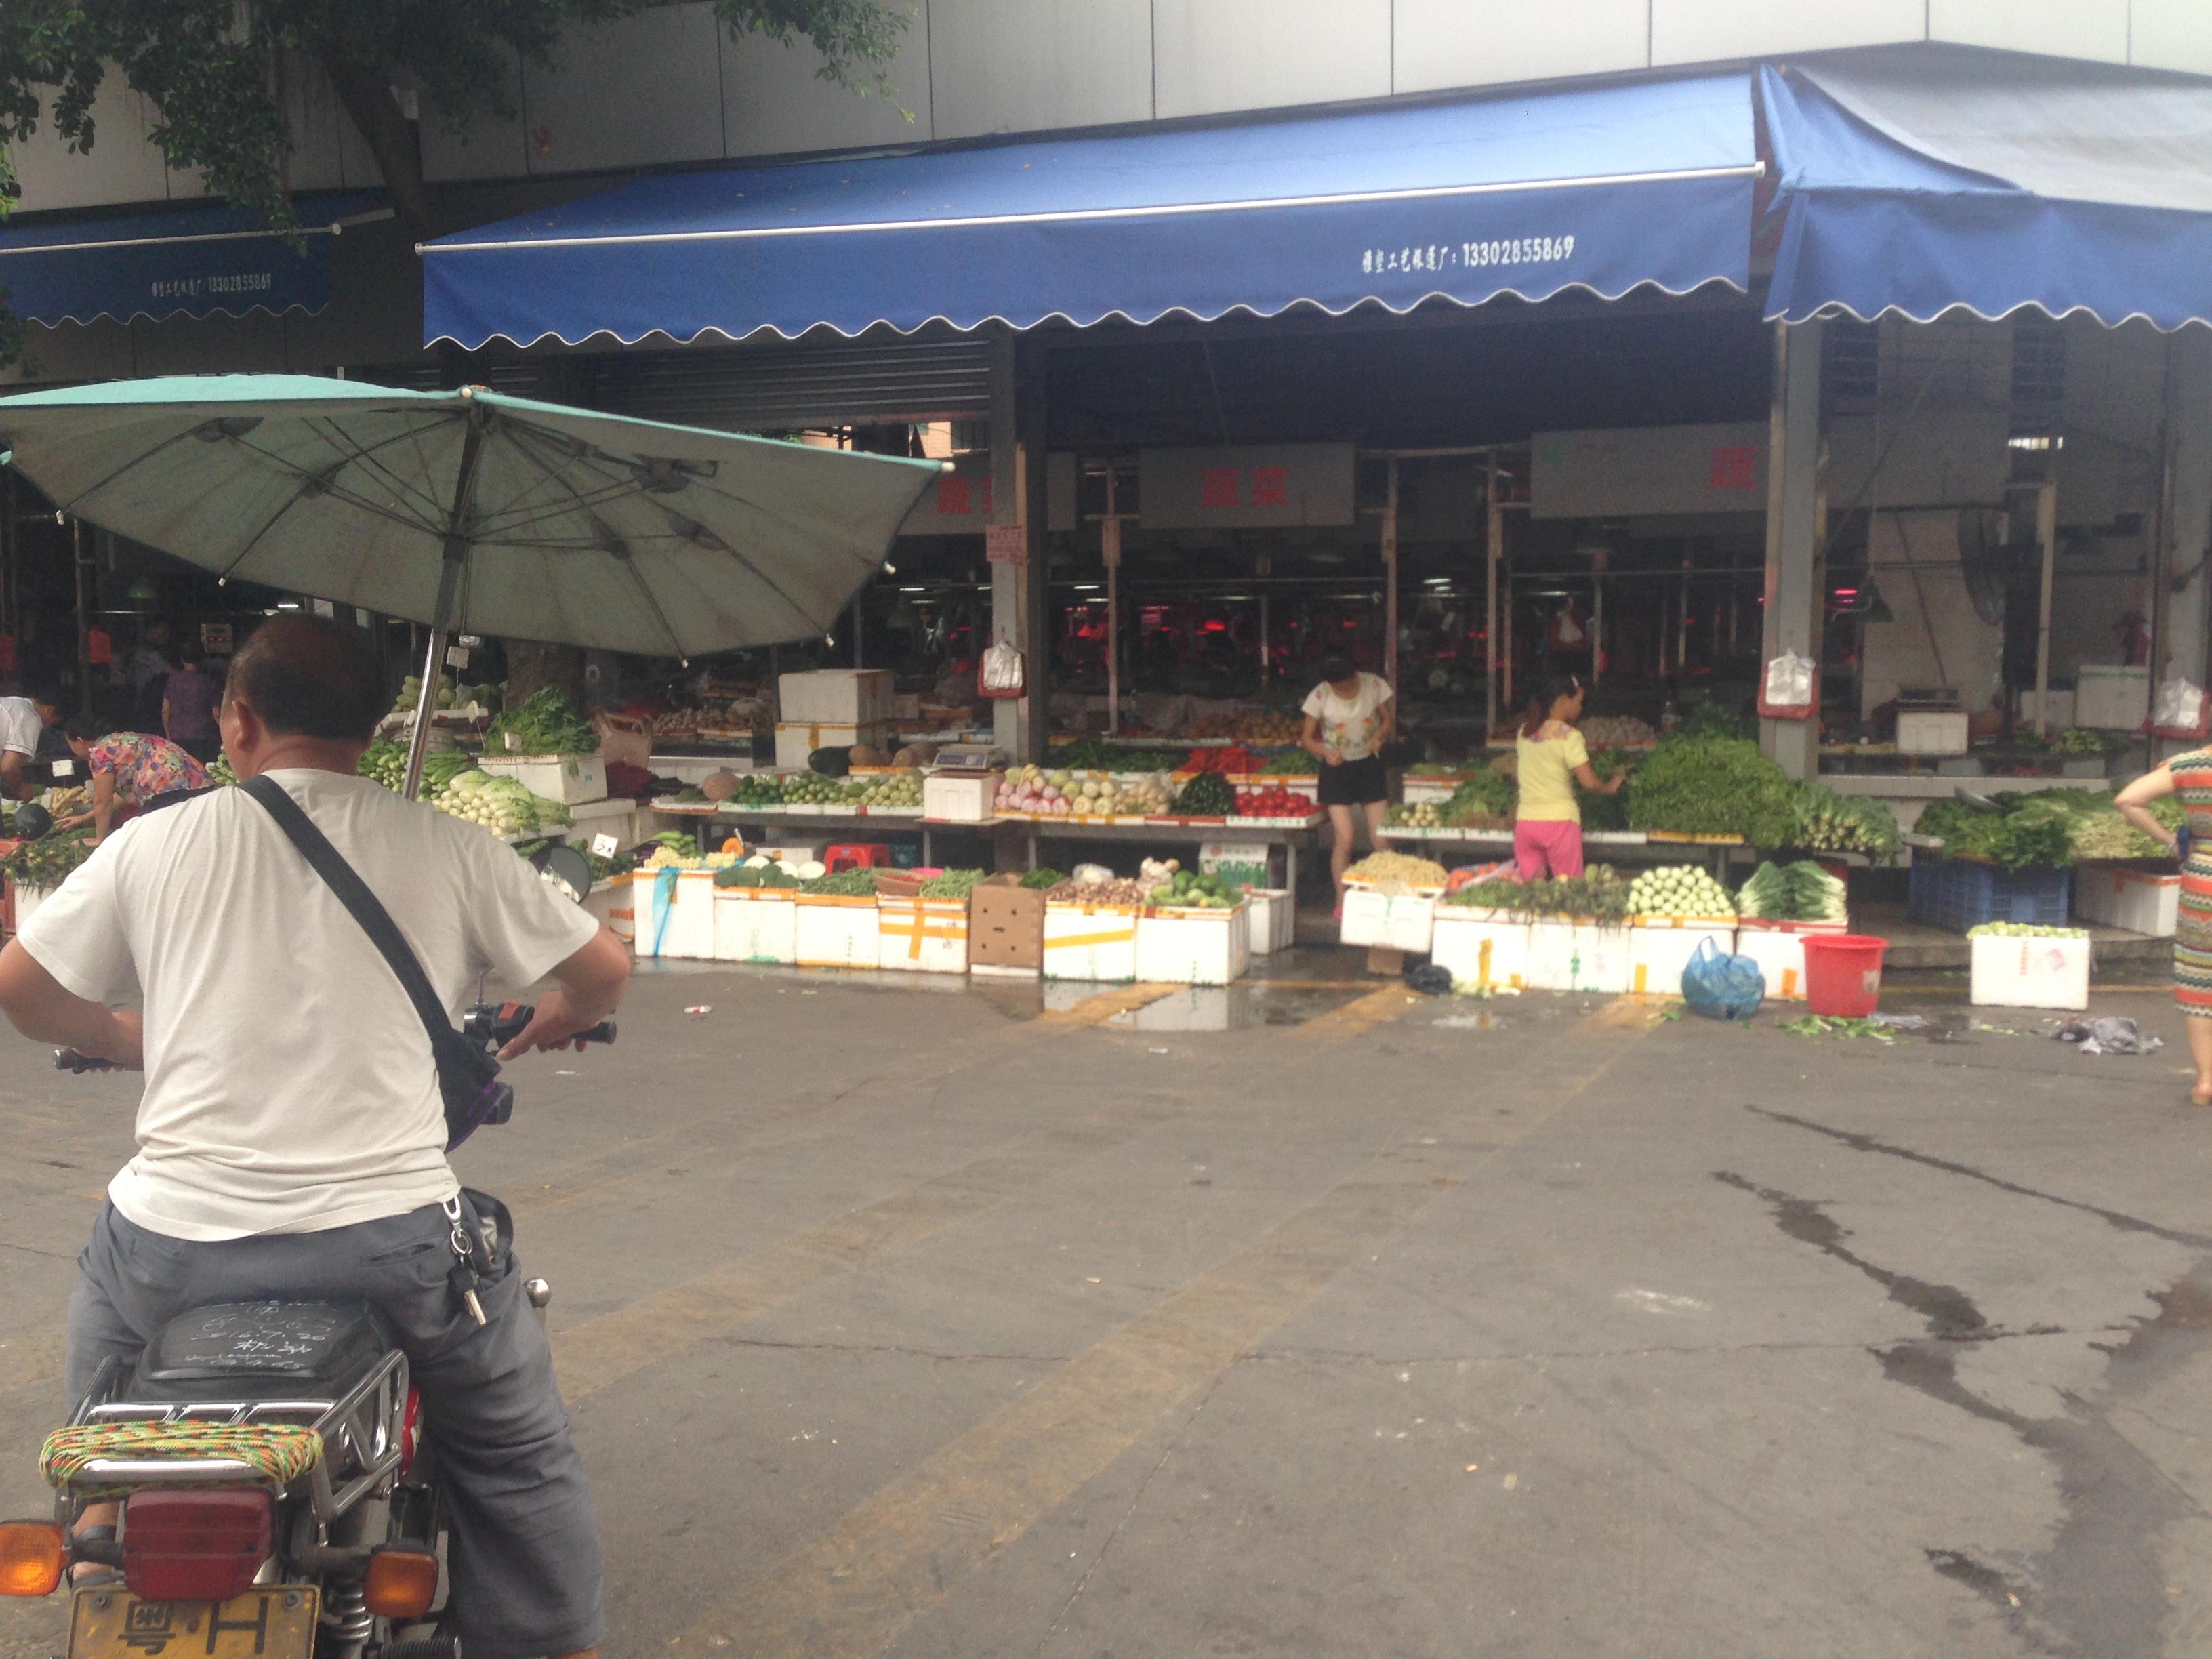 Street market in Foshan, China